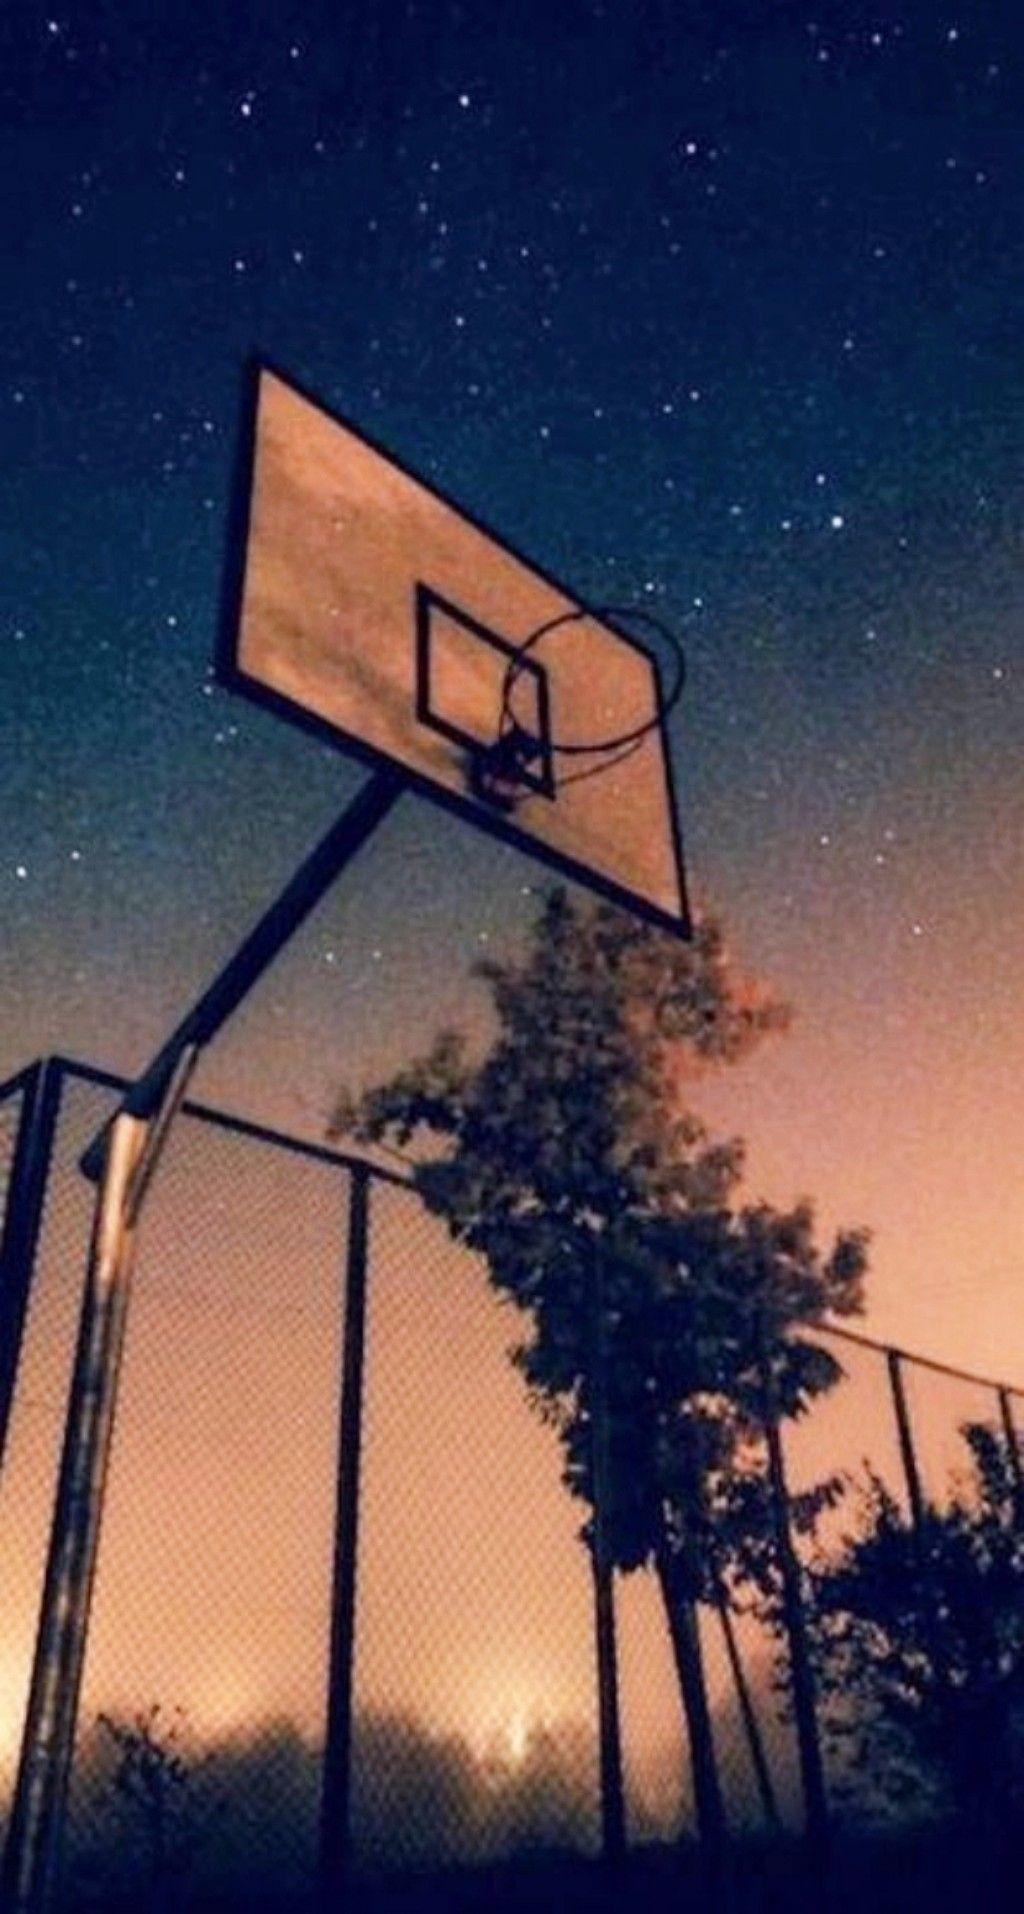 Pin by Mosesu on BASQUET | Basketball wallpapers hd ...